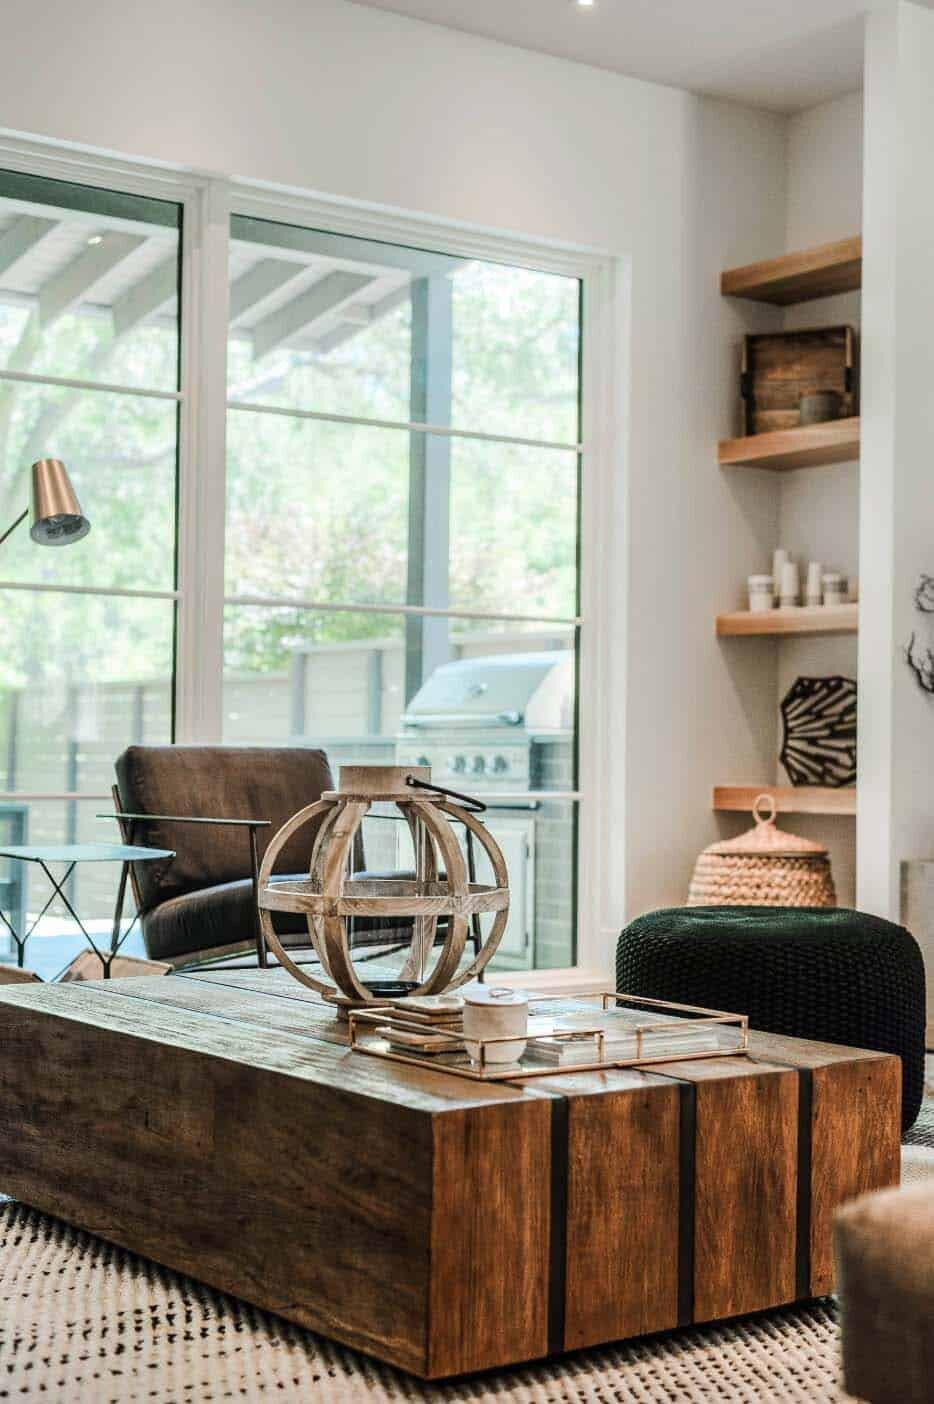 Organic-Modern-Style-Home-Urbanology-Designs-17-1-Kindesign.jpg